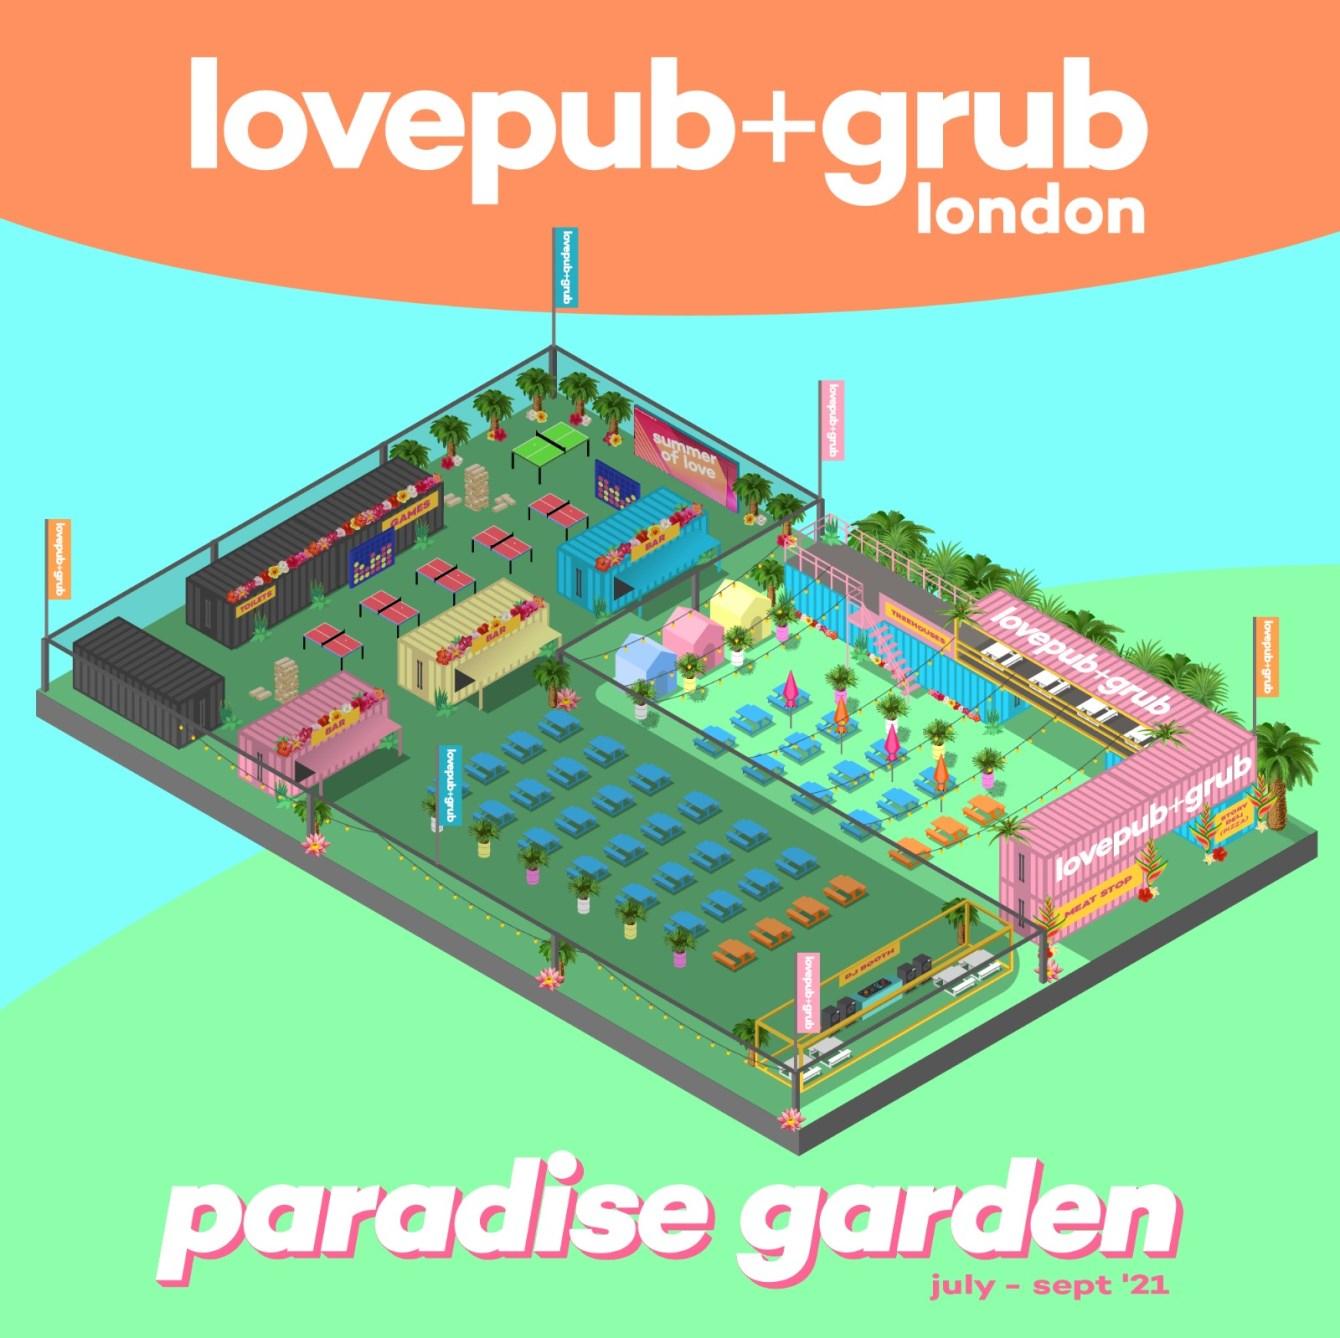 Love Pub & Grub - Sun 25 July - Flyer back